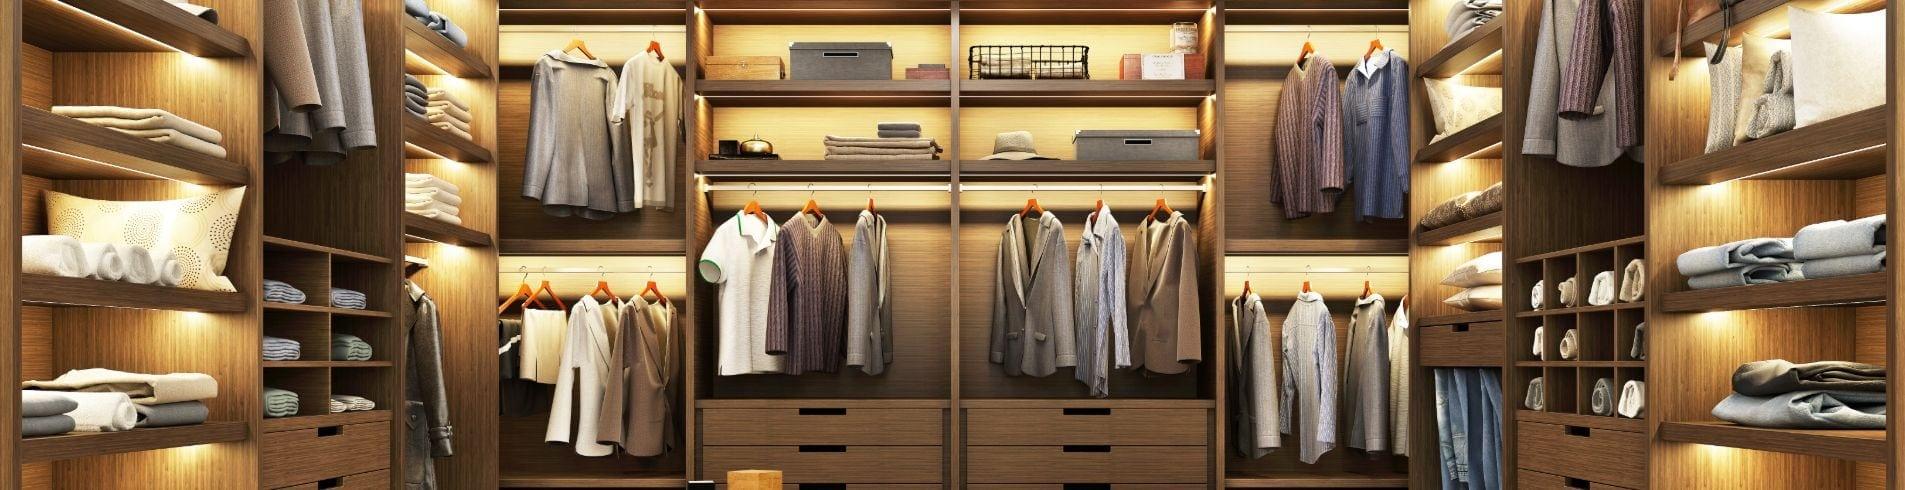 Built-in & Custom Closets